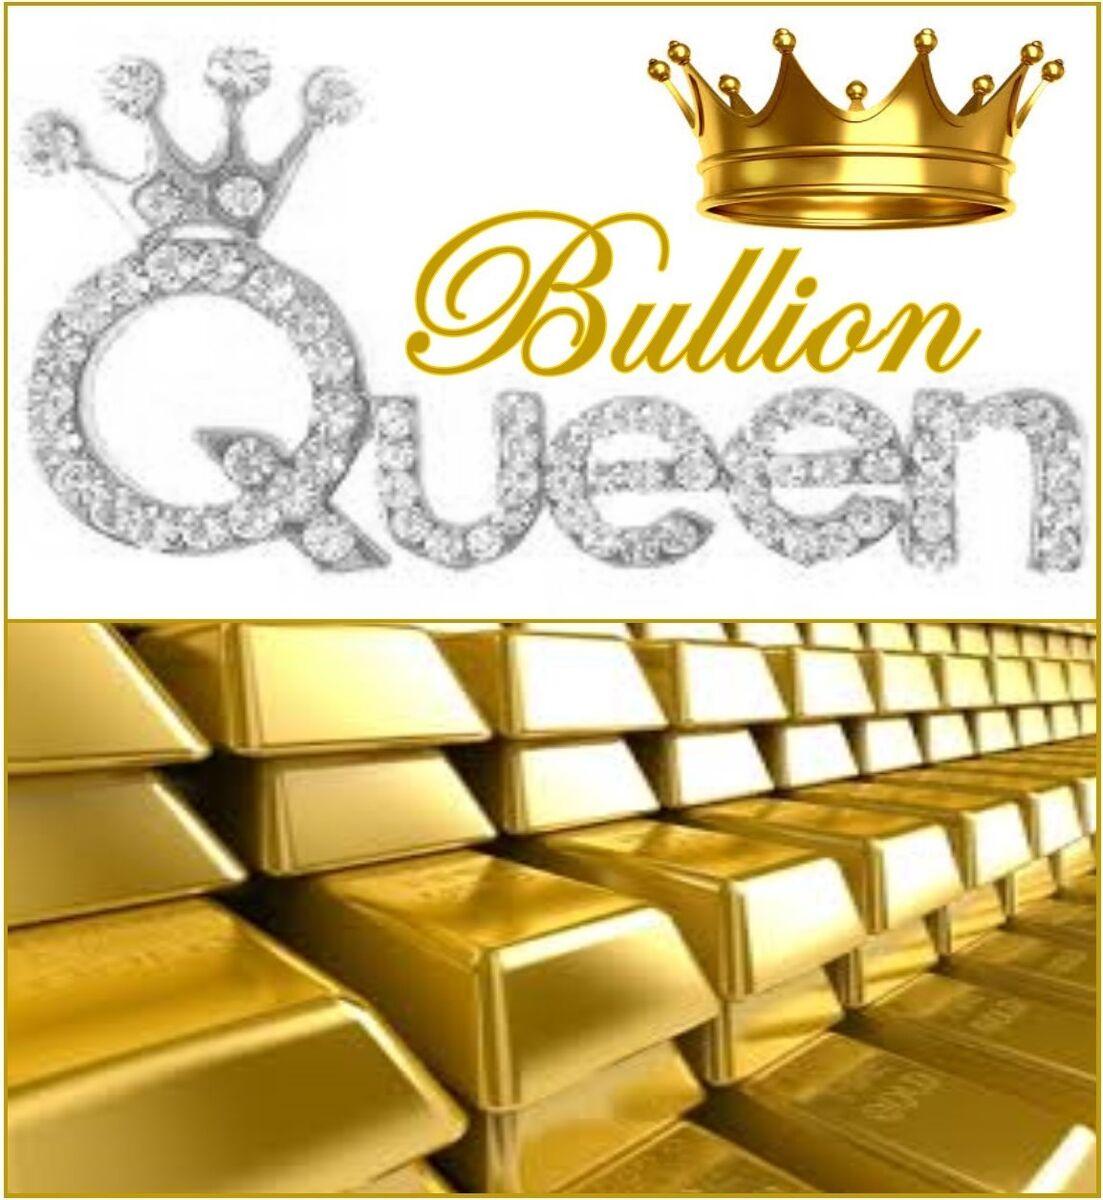 Bullion Pro Shop